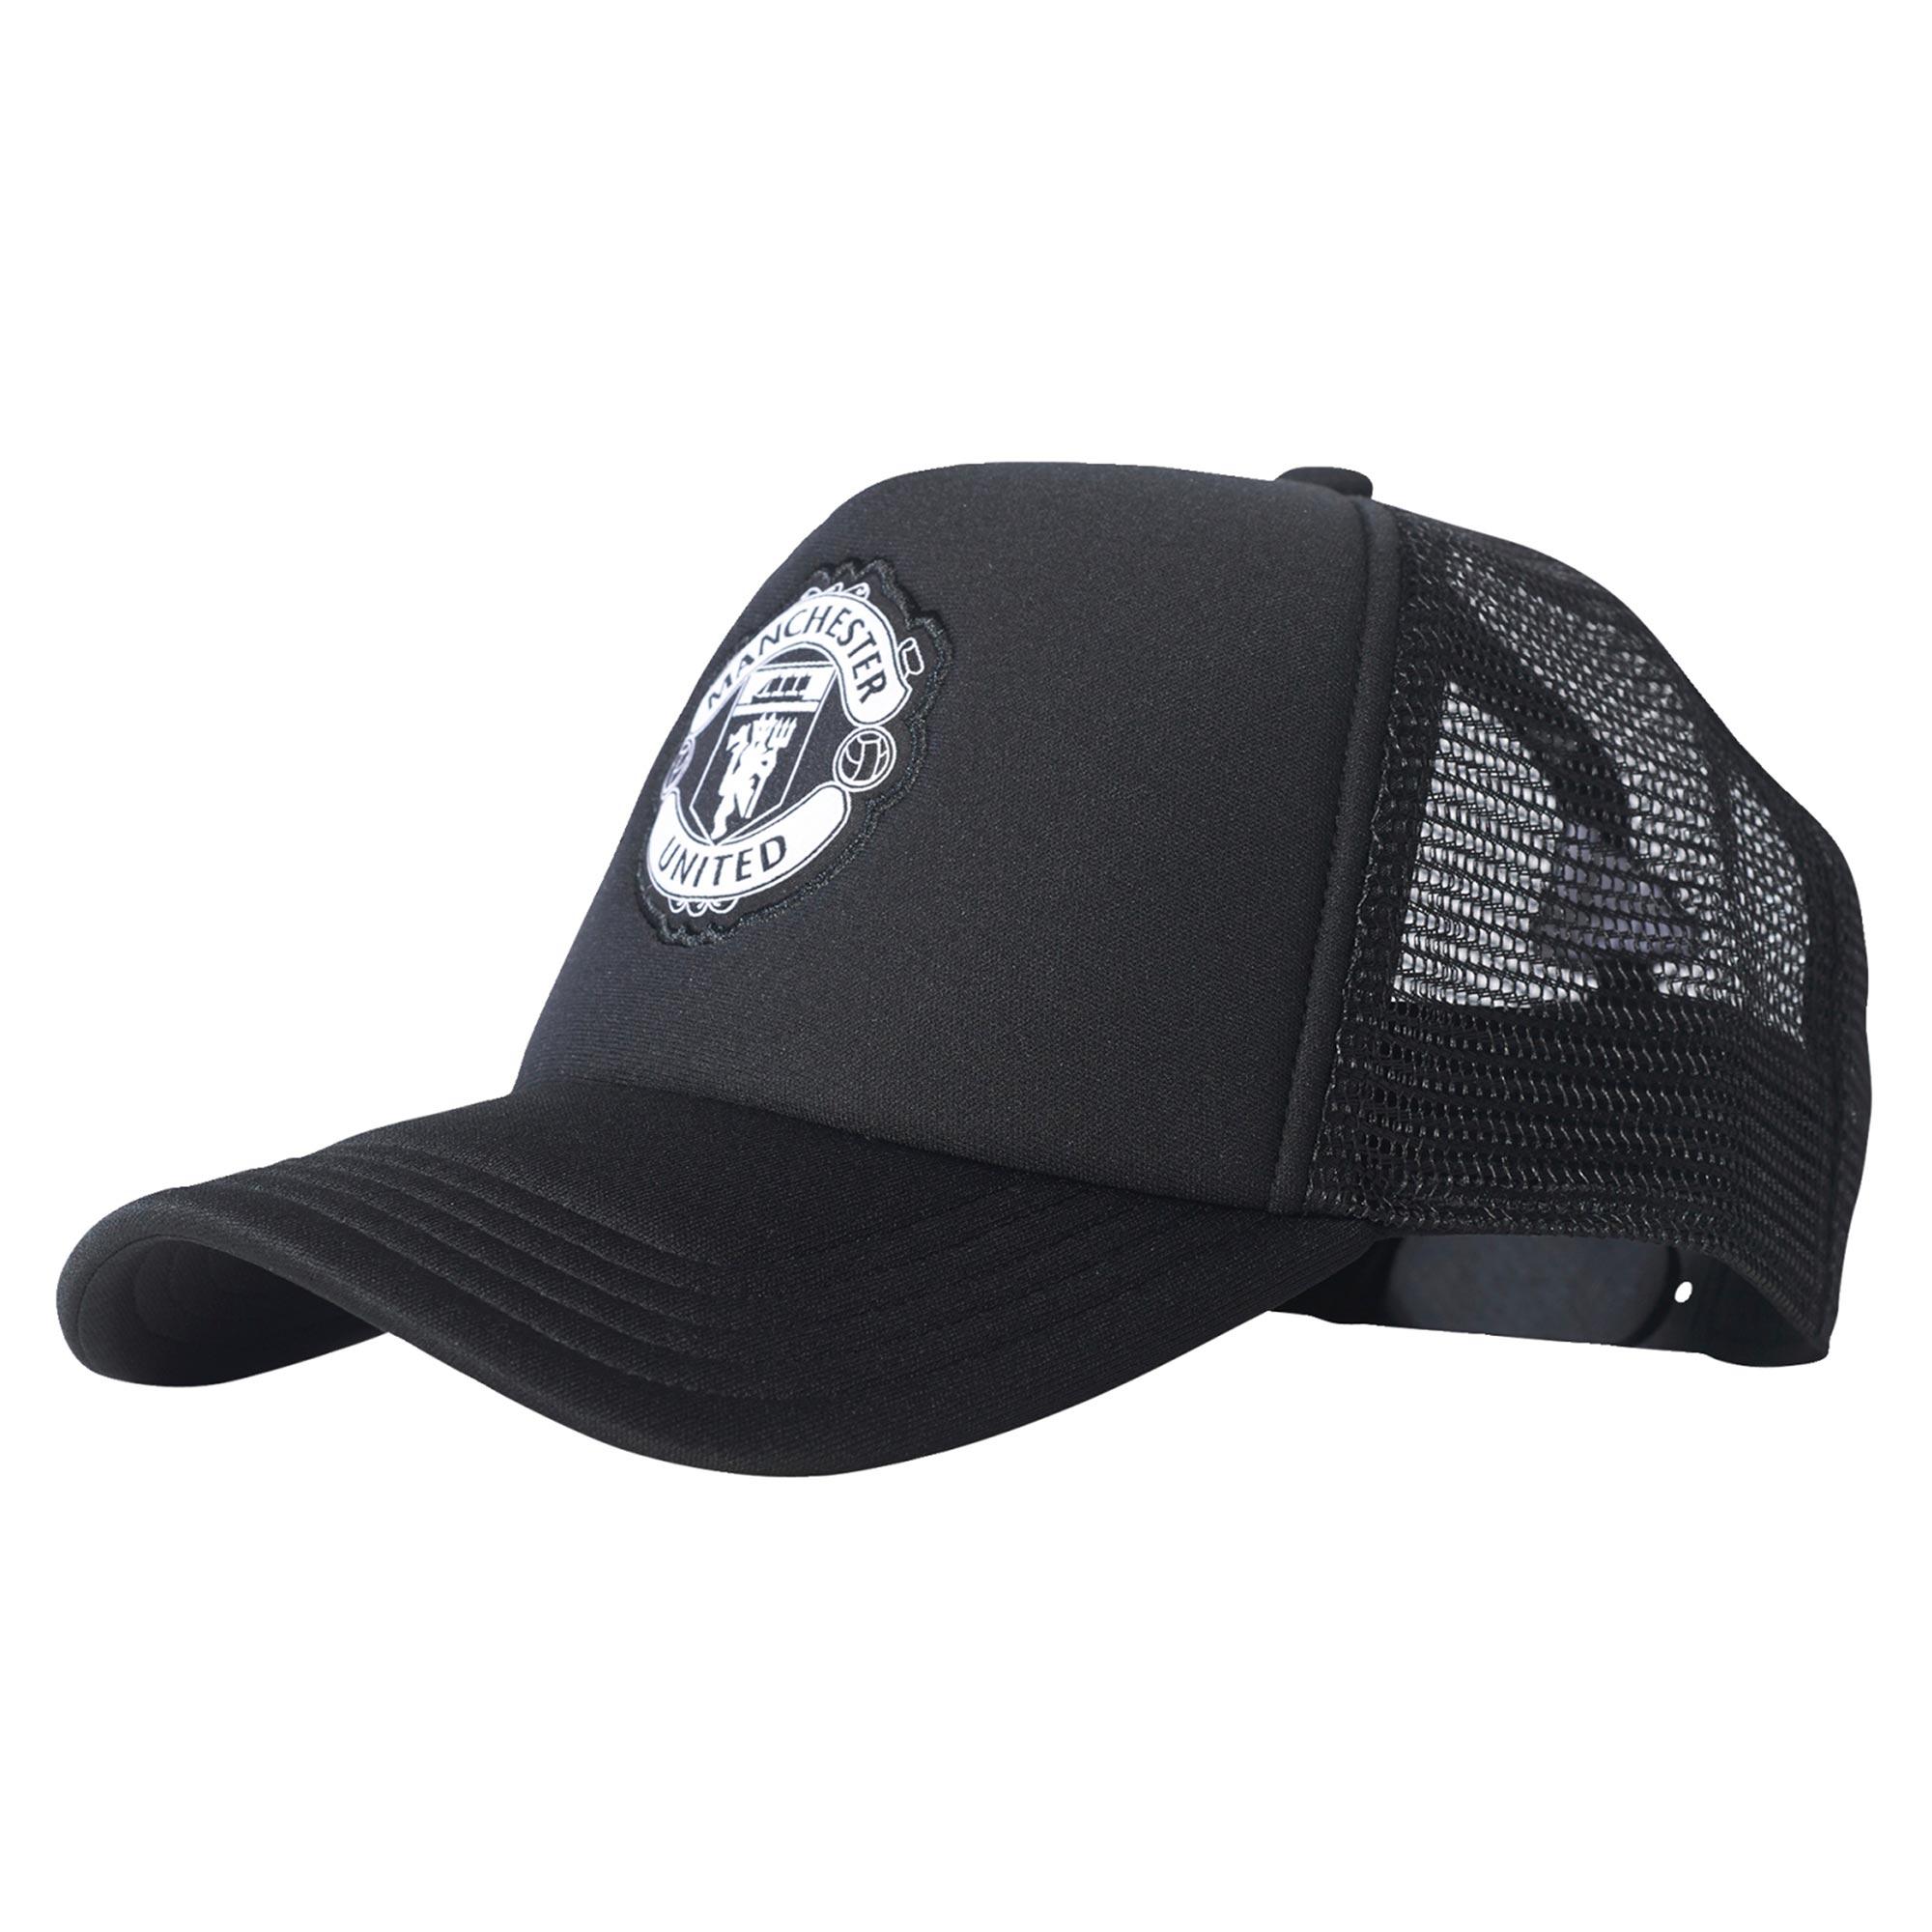 Manchester United Trucker Cap - Black